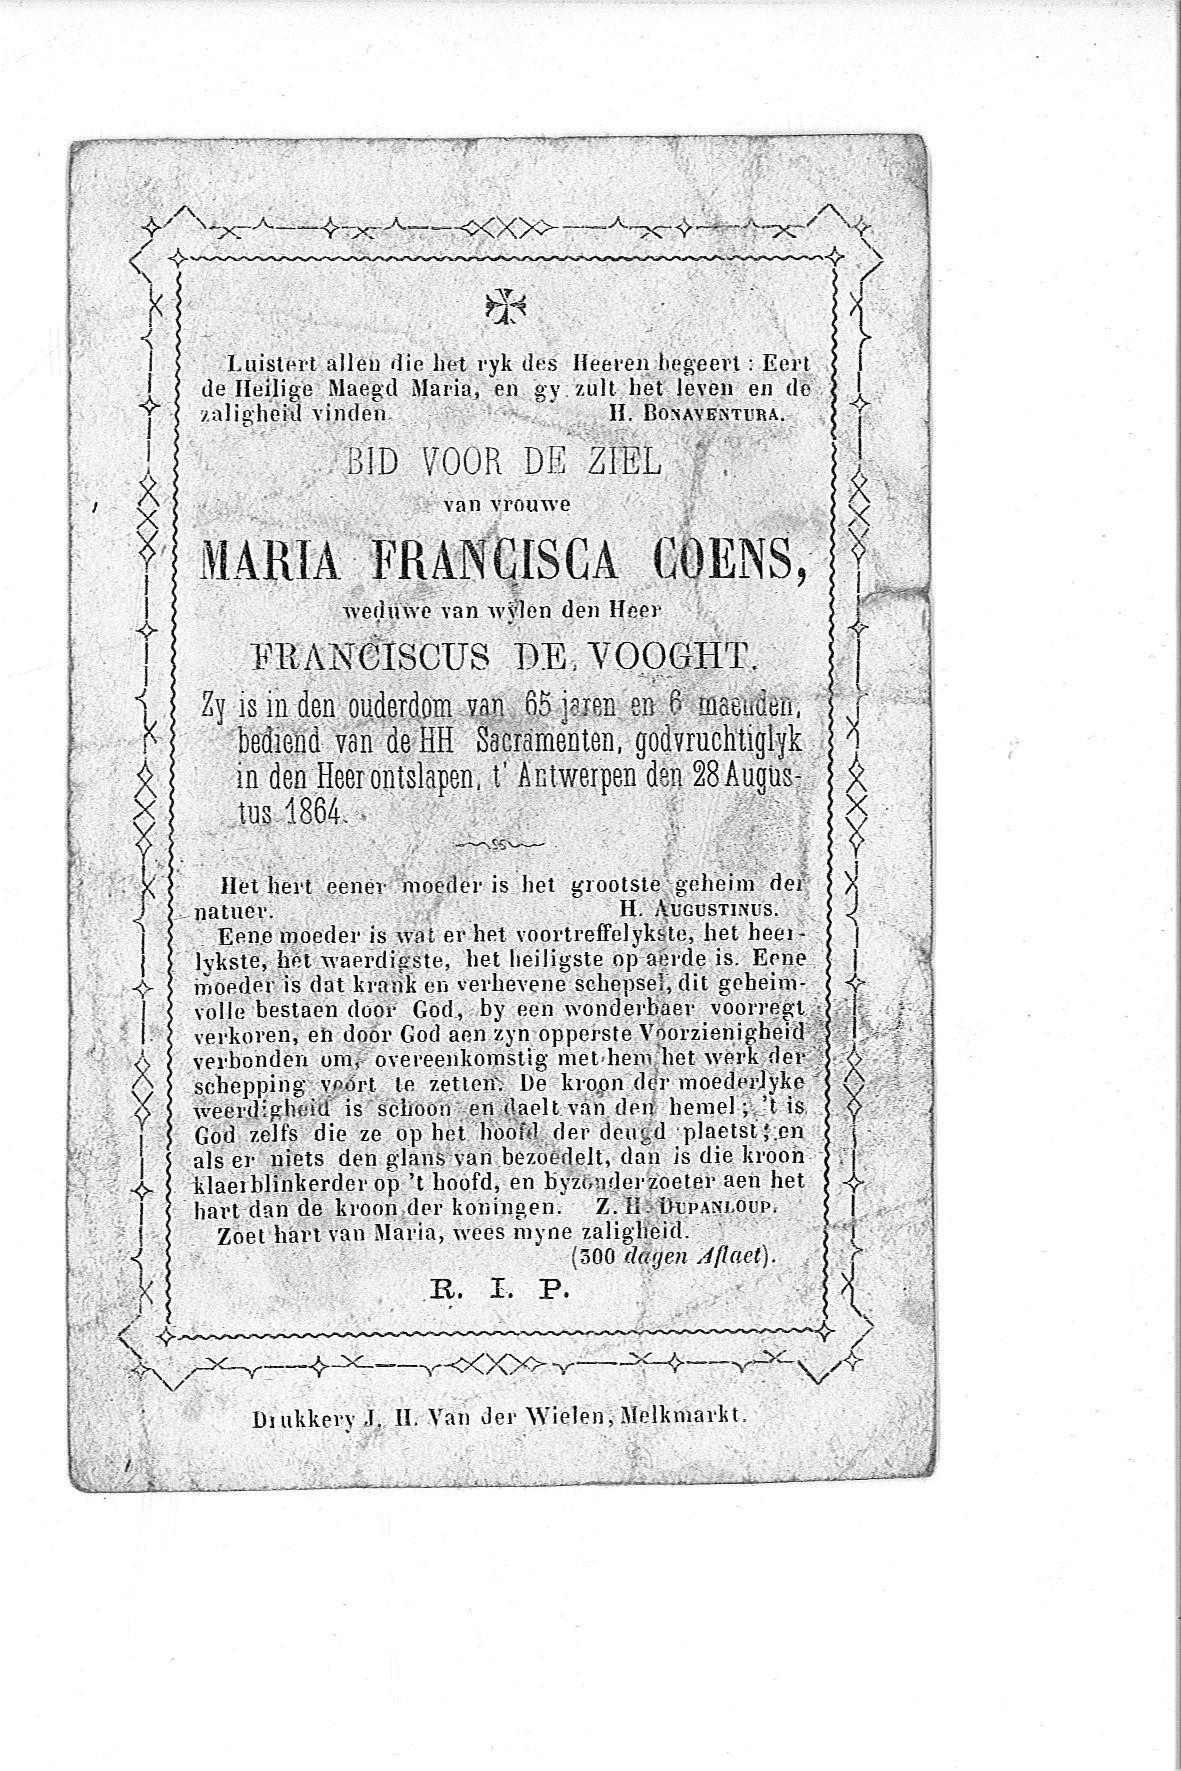 maria-francisca(1864)20090324121821_00011.jpg